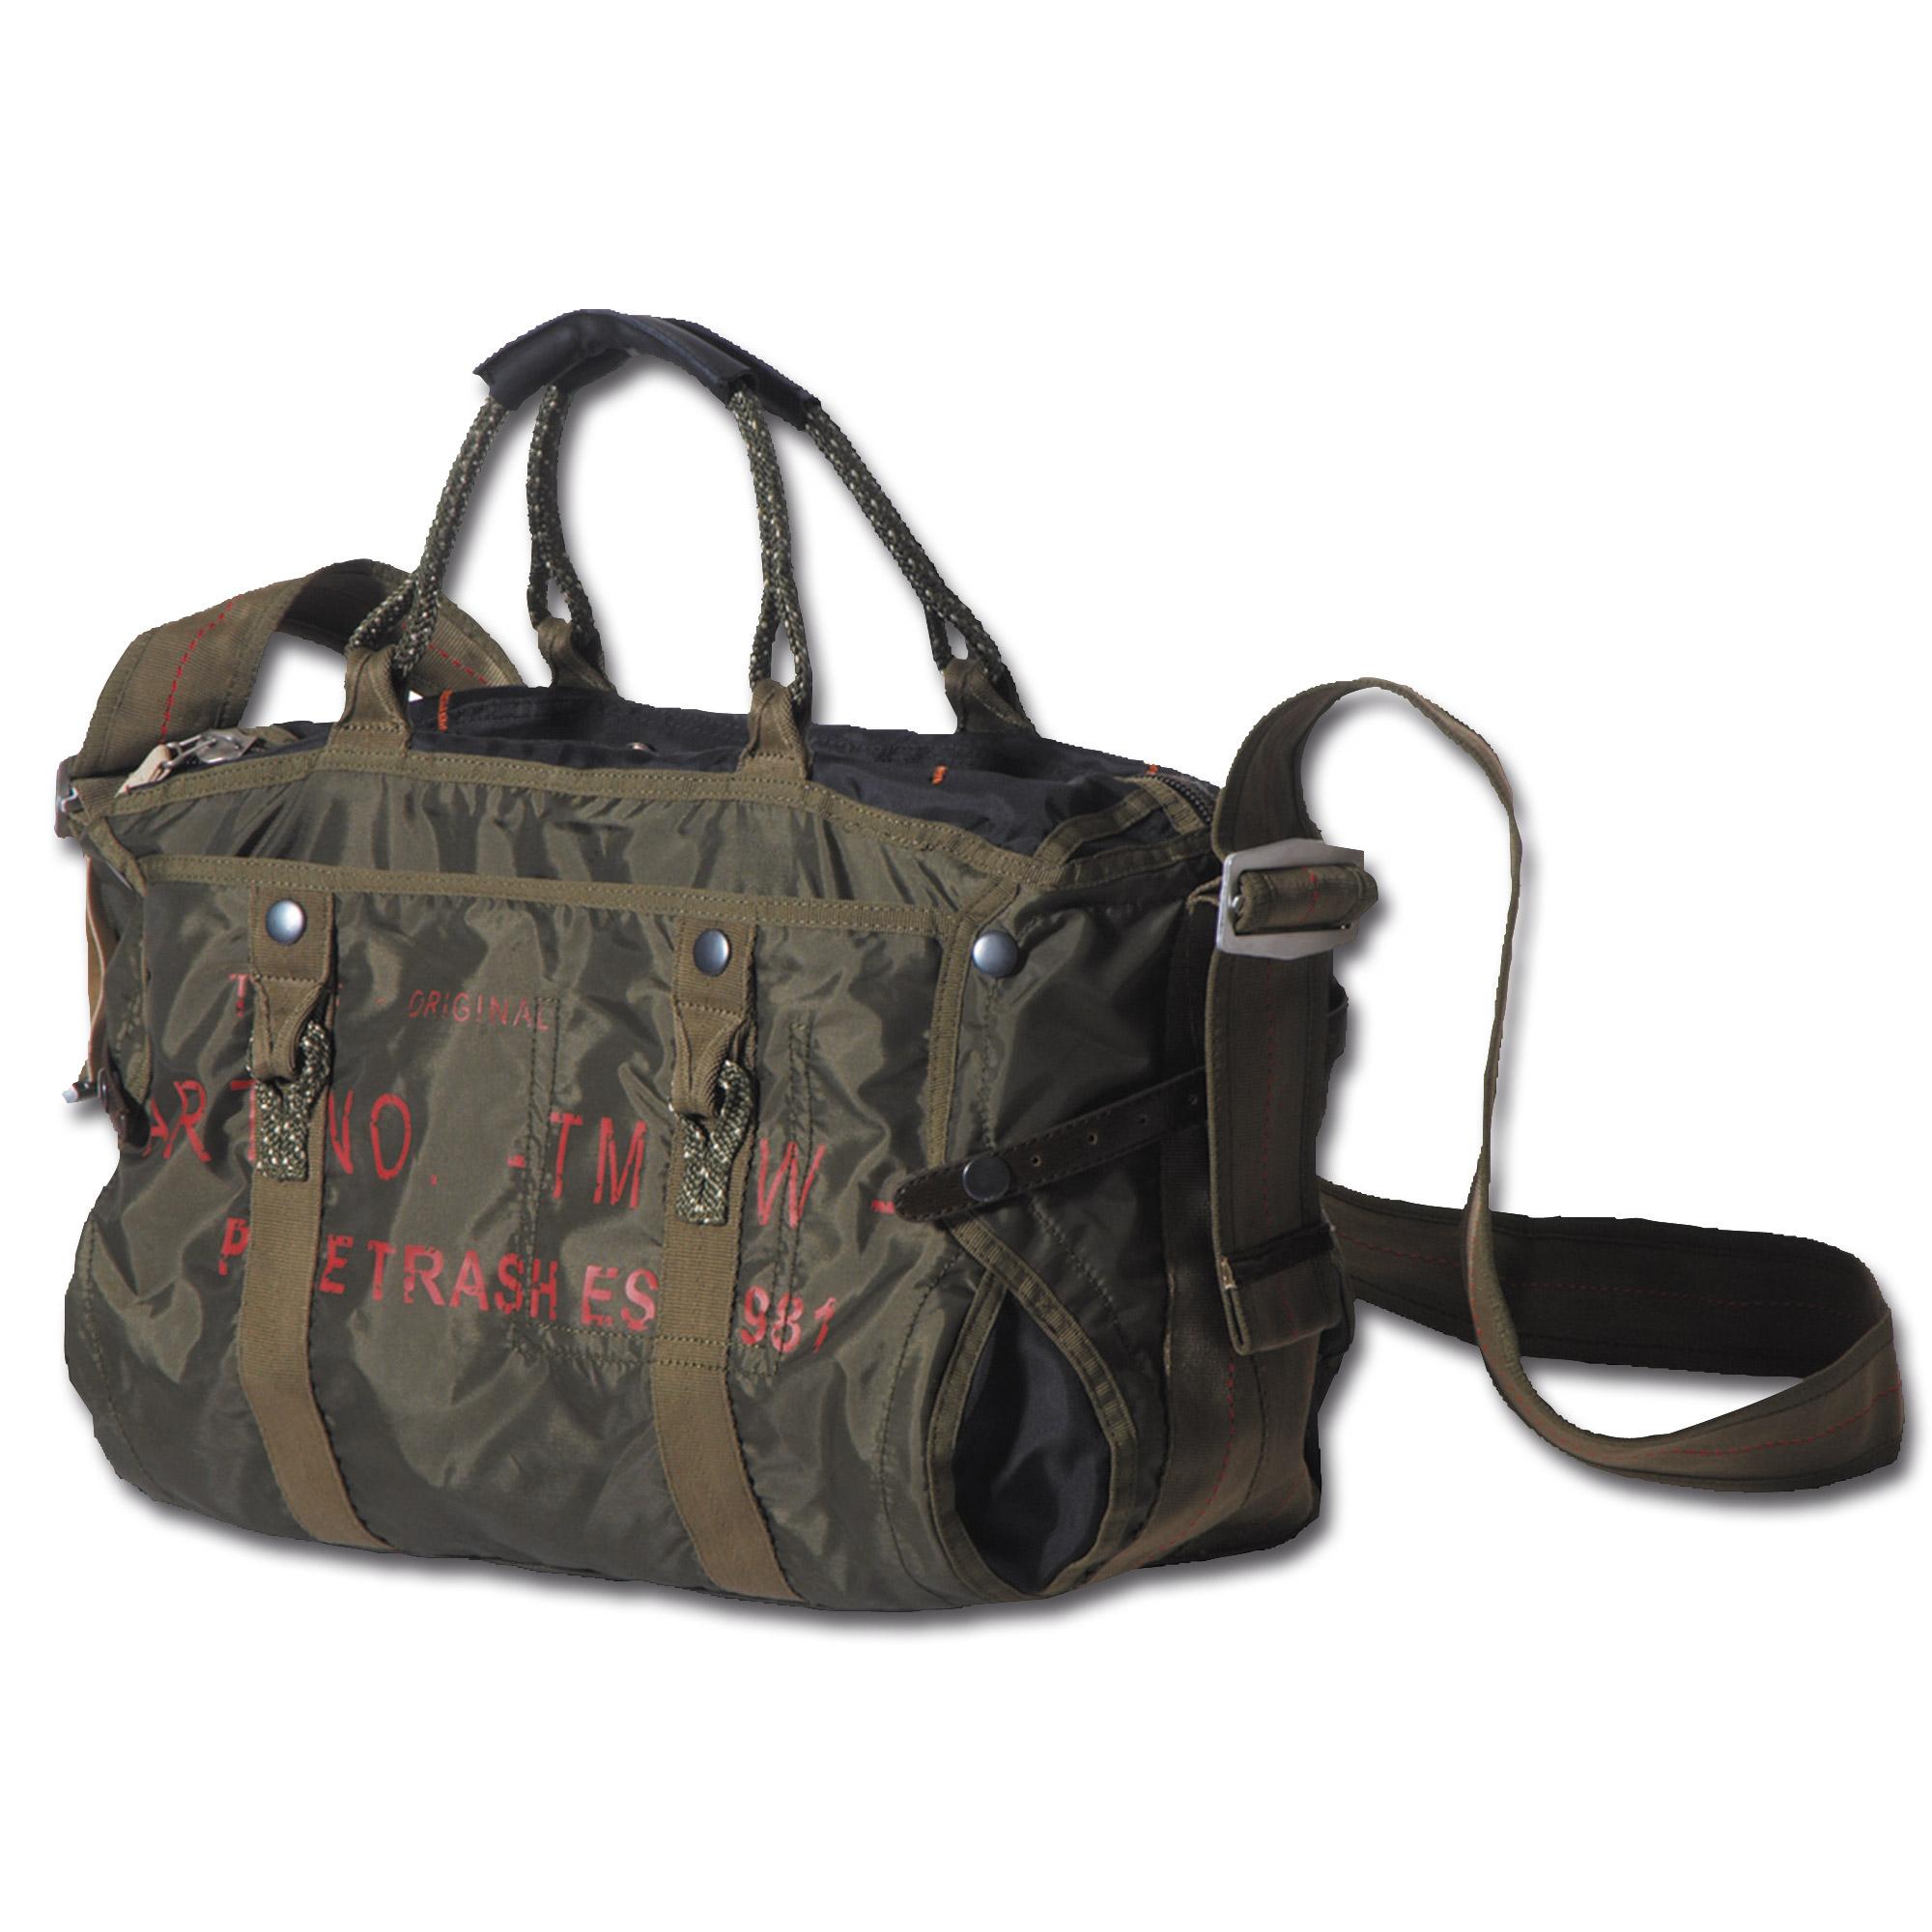 Handbag Pure Trash Nylon Large